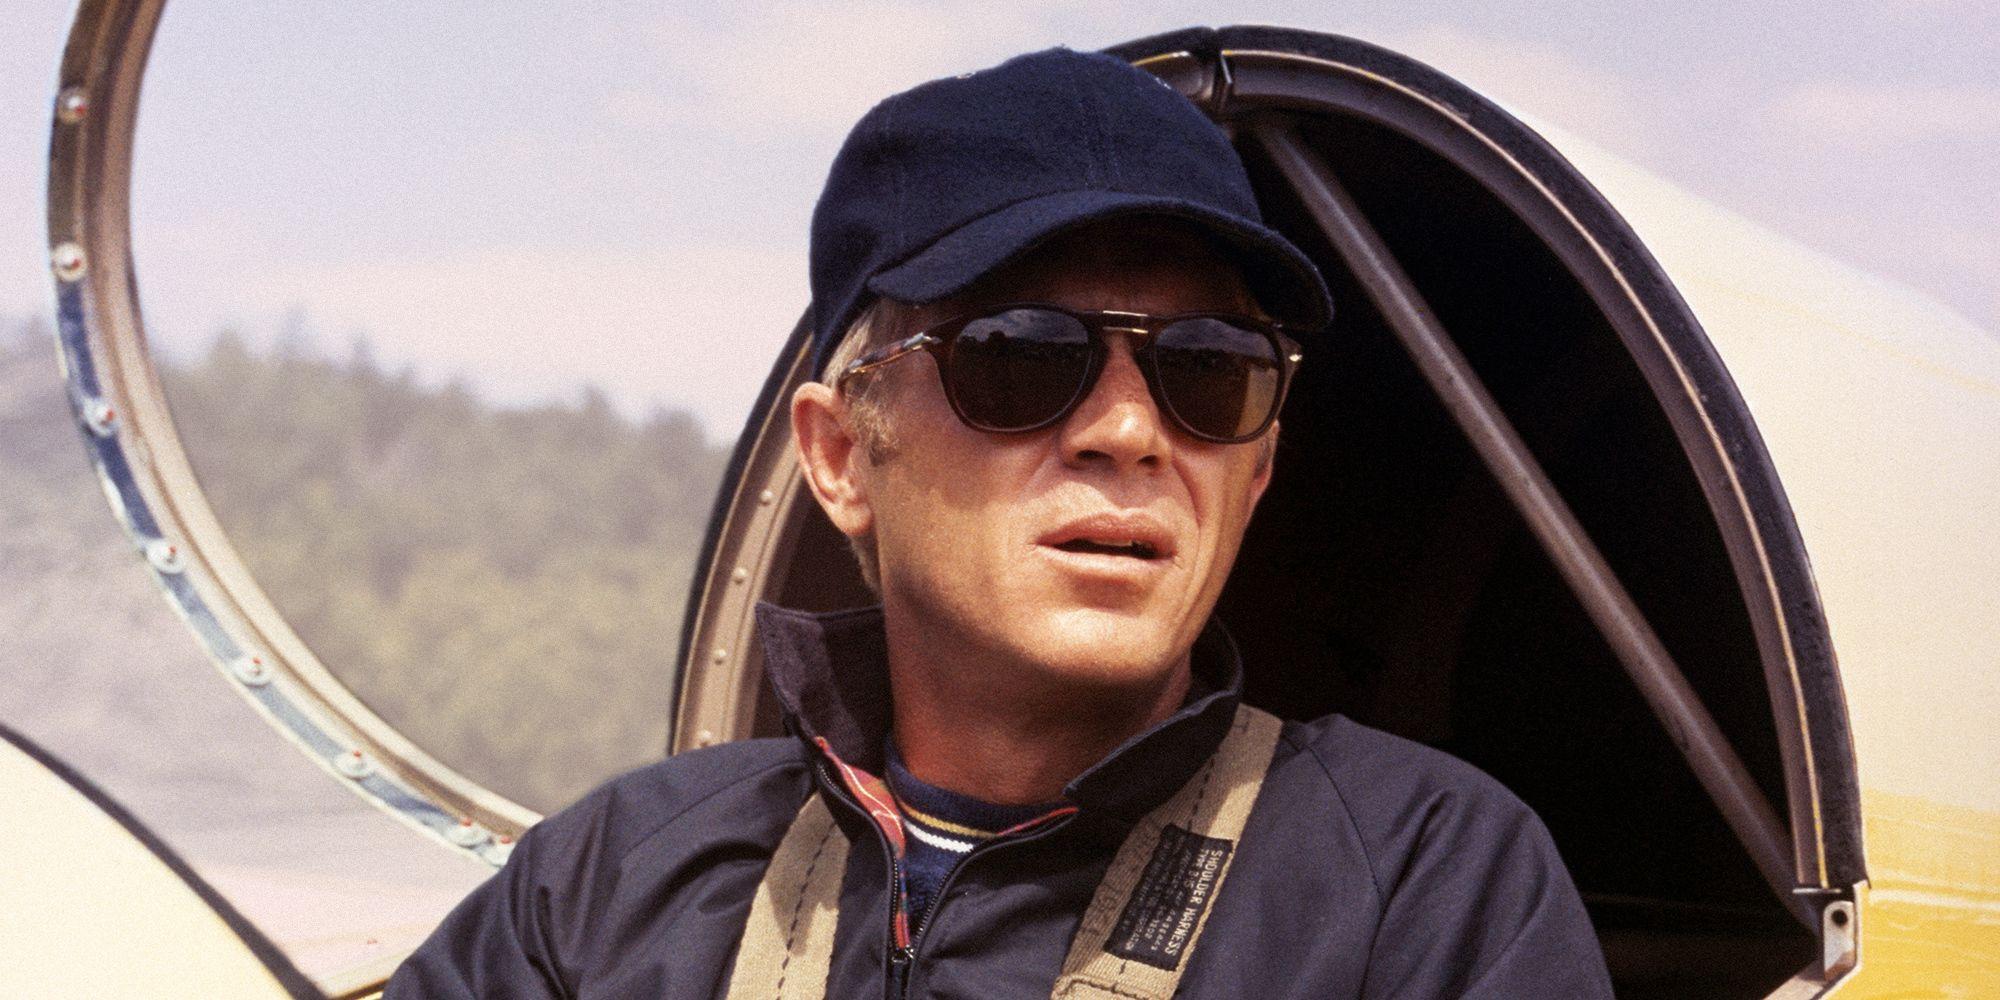 Steve McQueen's Iconic Persols Just Got a Damn Cool Update